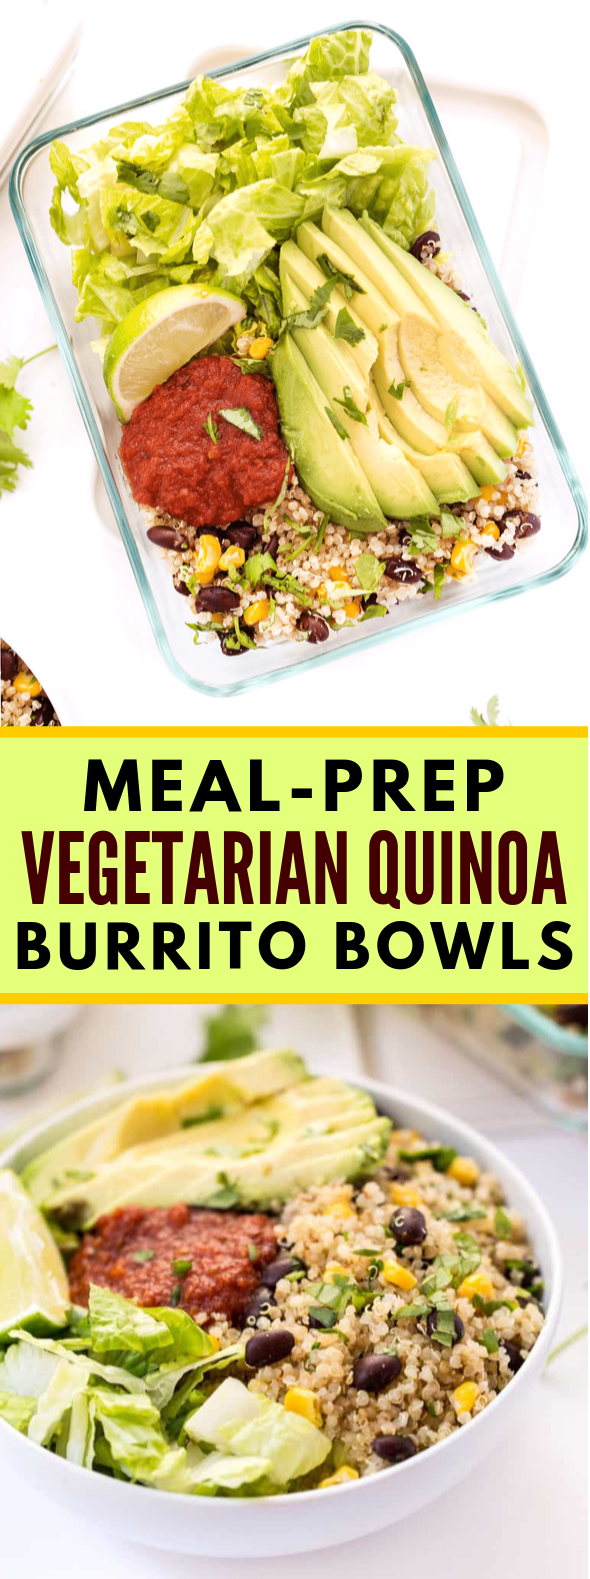 Meal-Prep Vegetarian Quinoa Burrito Bowls #vegan #dinner